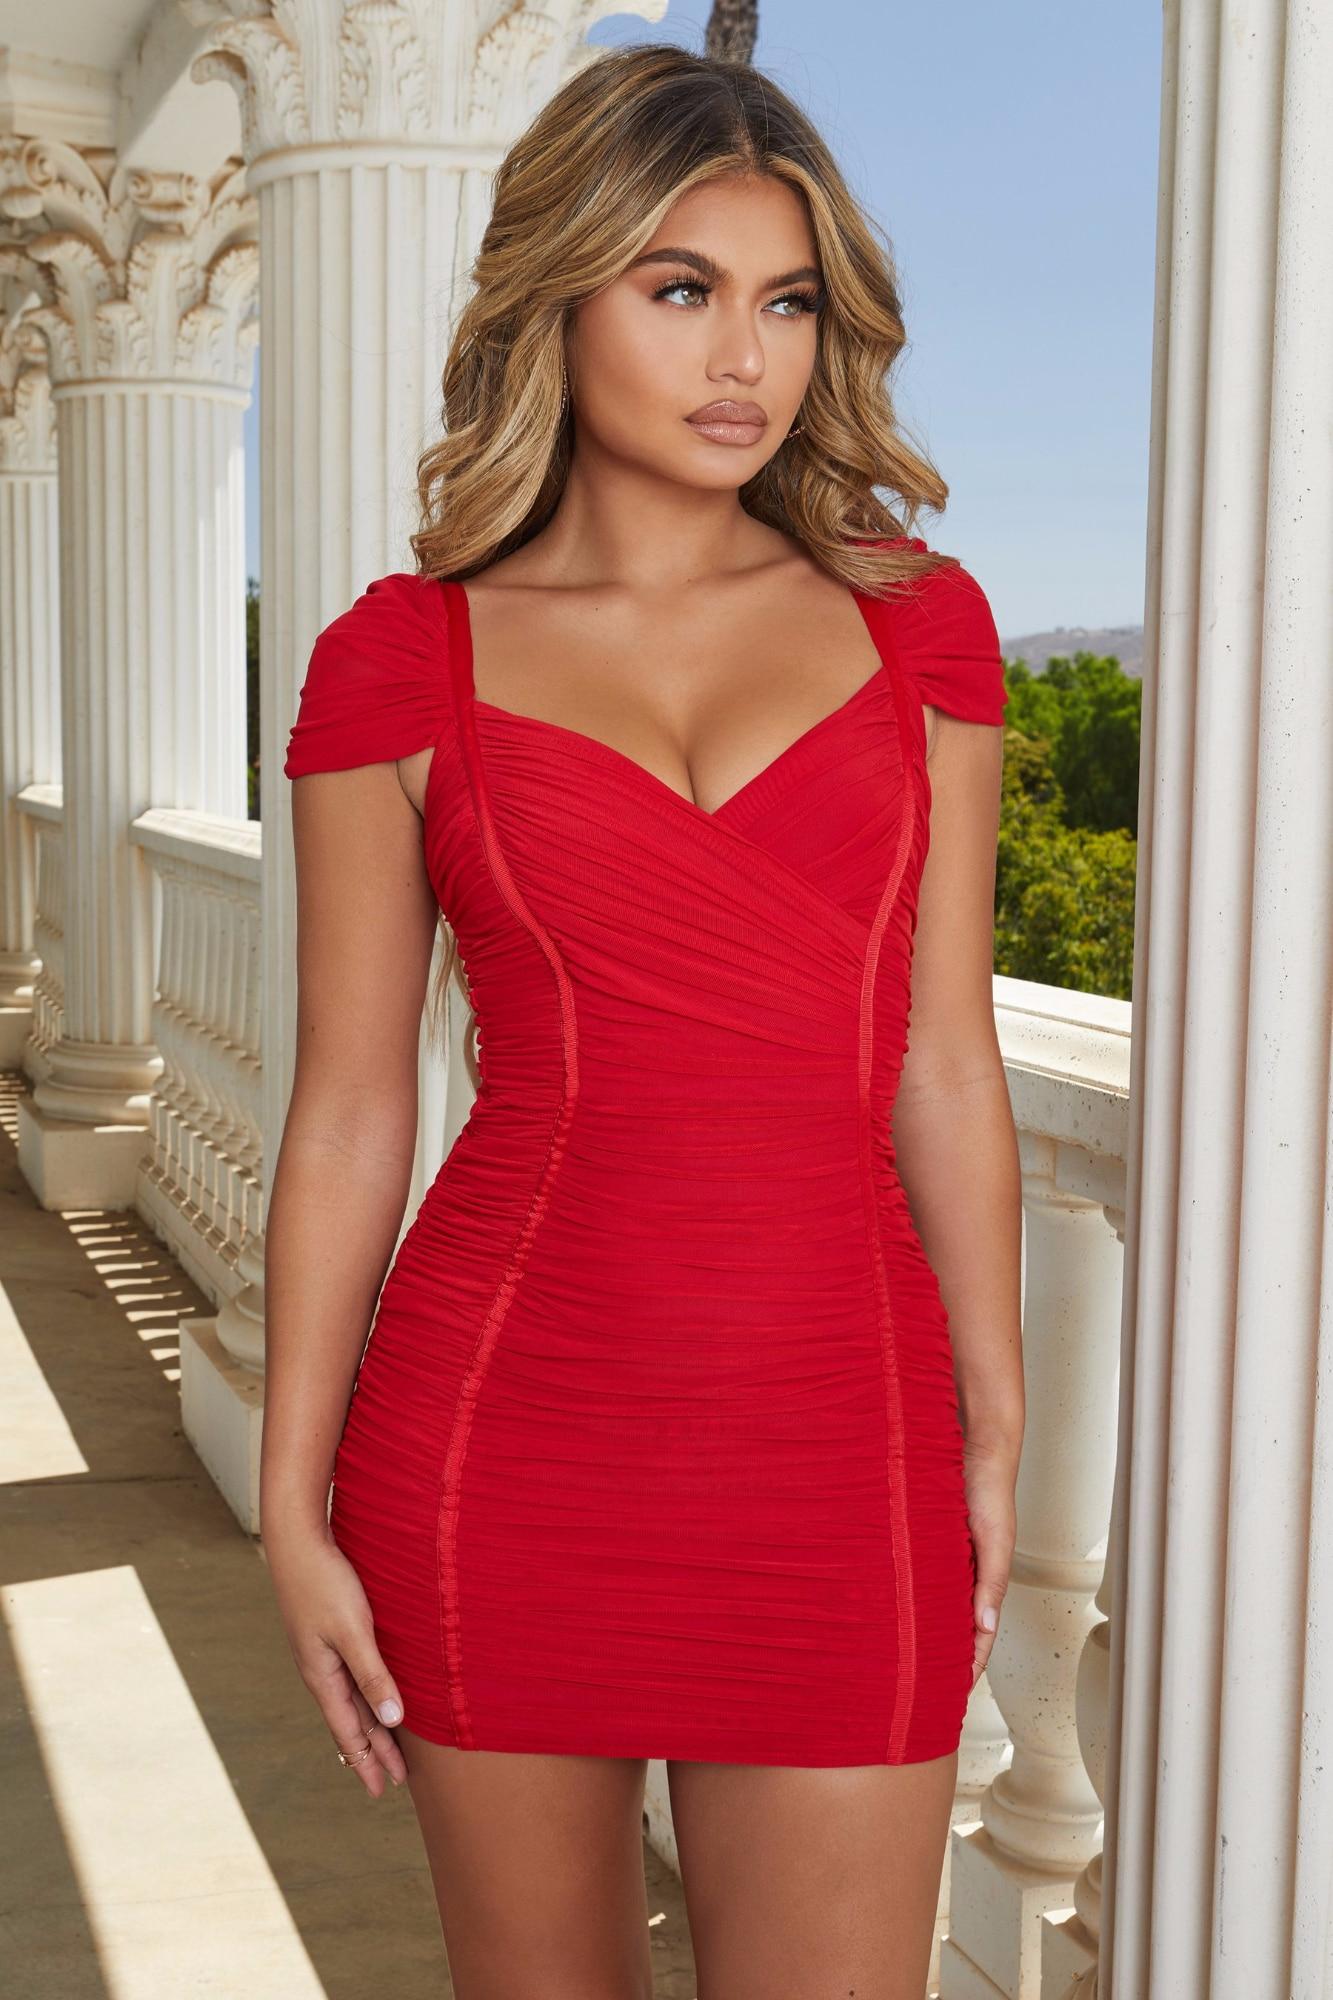 2019 New Woman white red V-Neck Spaghetti straps Elastic Rayon Party Vestidos Bodycon Bandage Dress